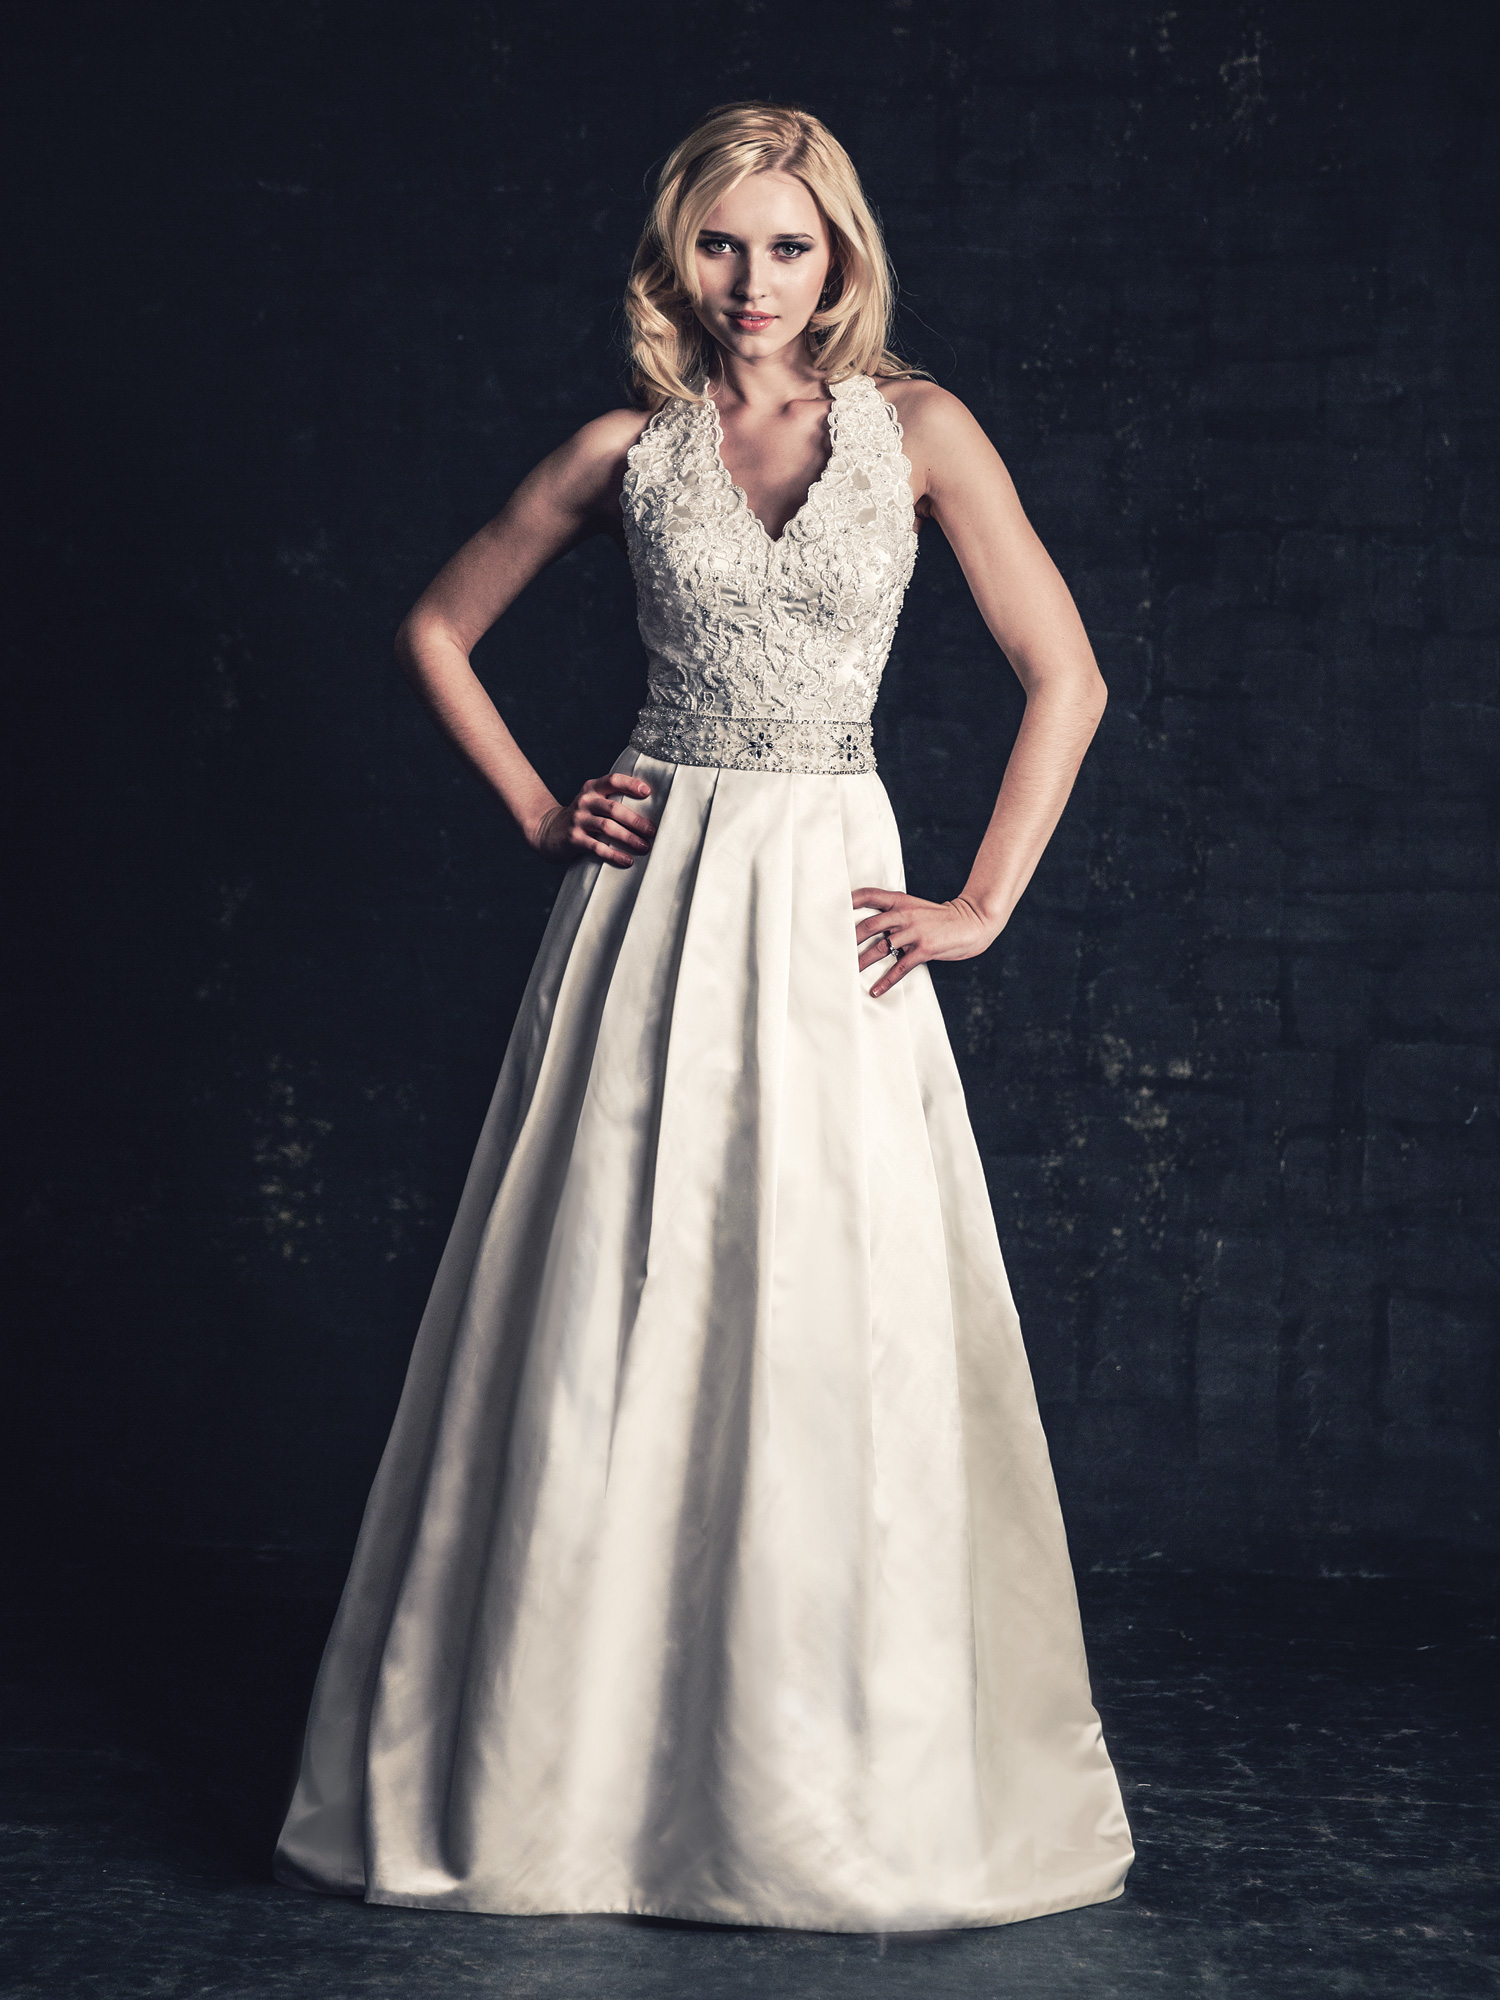 white, ivory, silver, Modern, Classic, Romantic, Lace, A-line, Beading, Halter, V-neck, Satin, Floor, Natural, Sleeveless, Ella Rosa